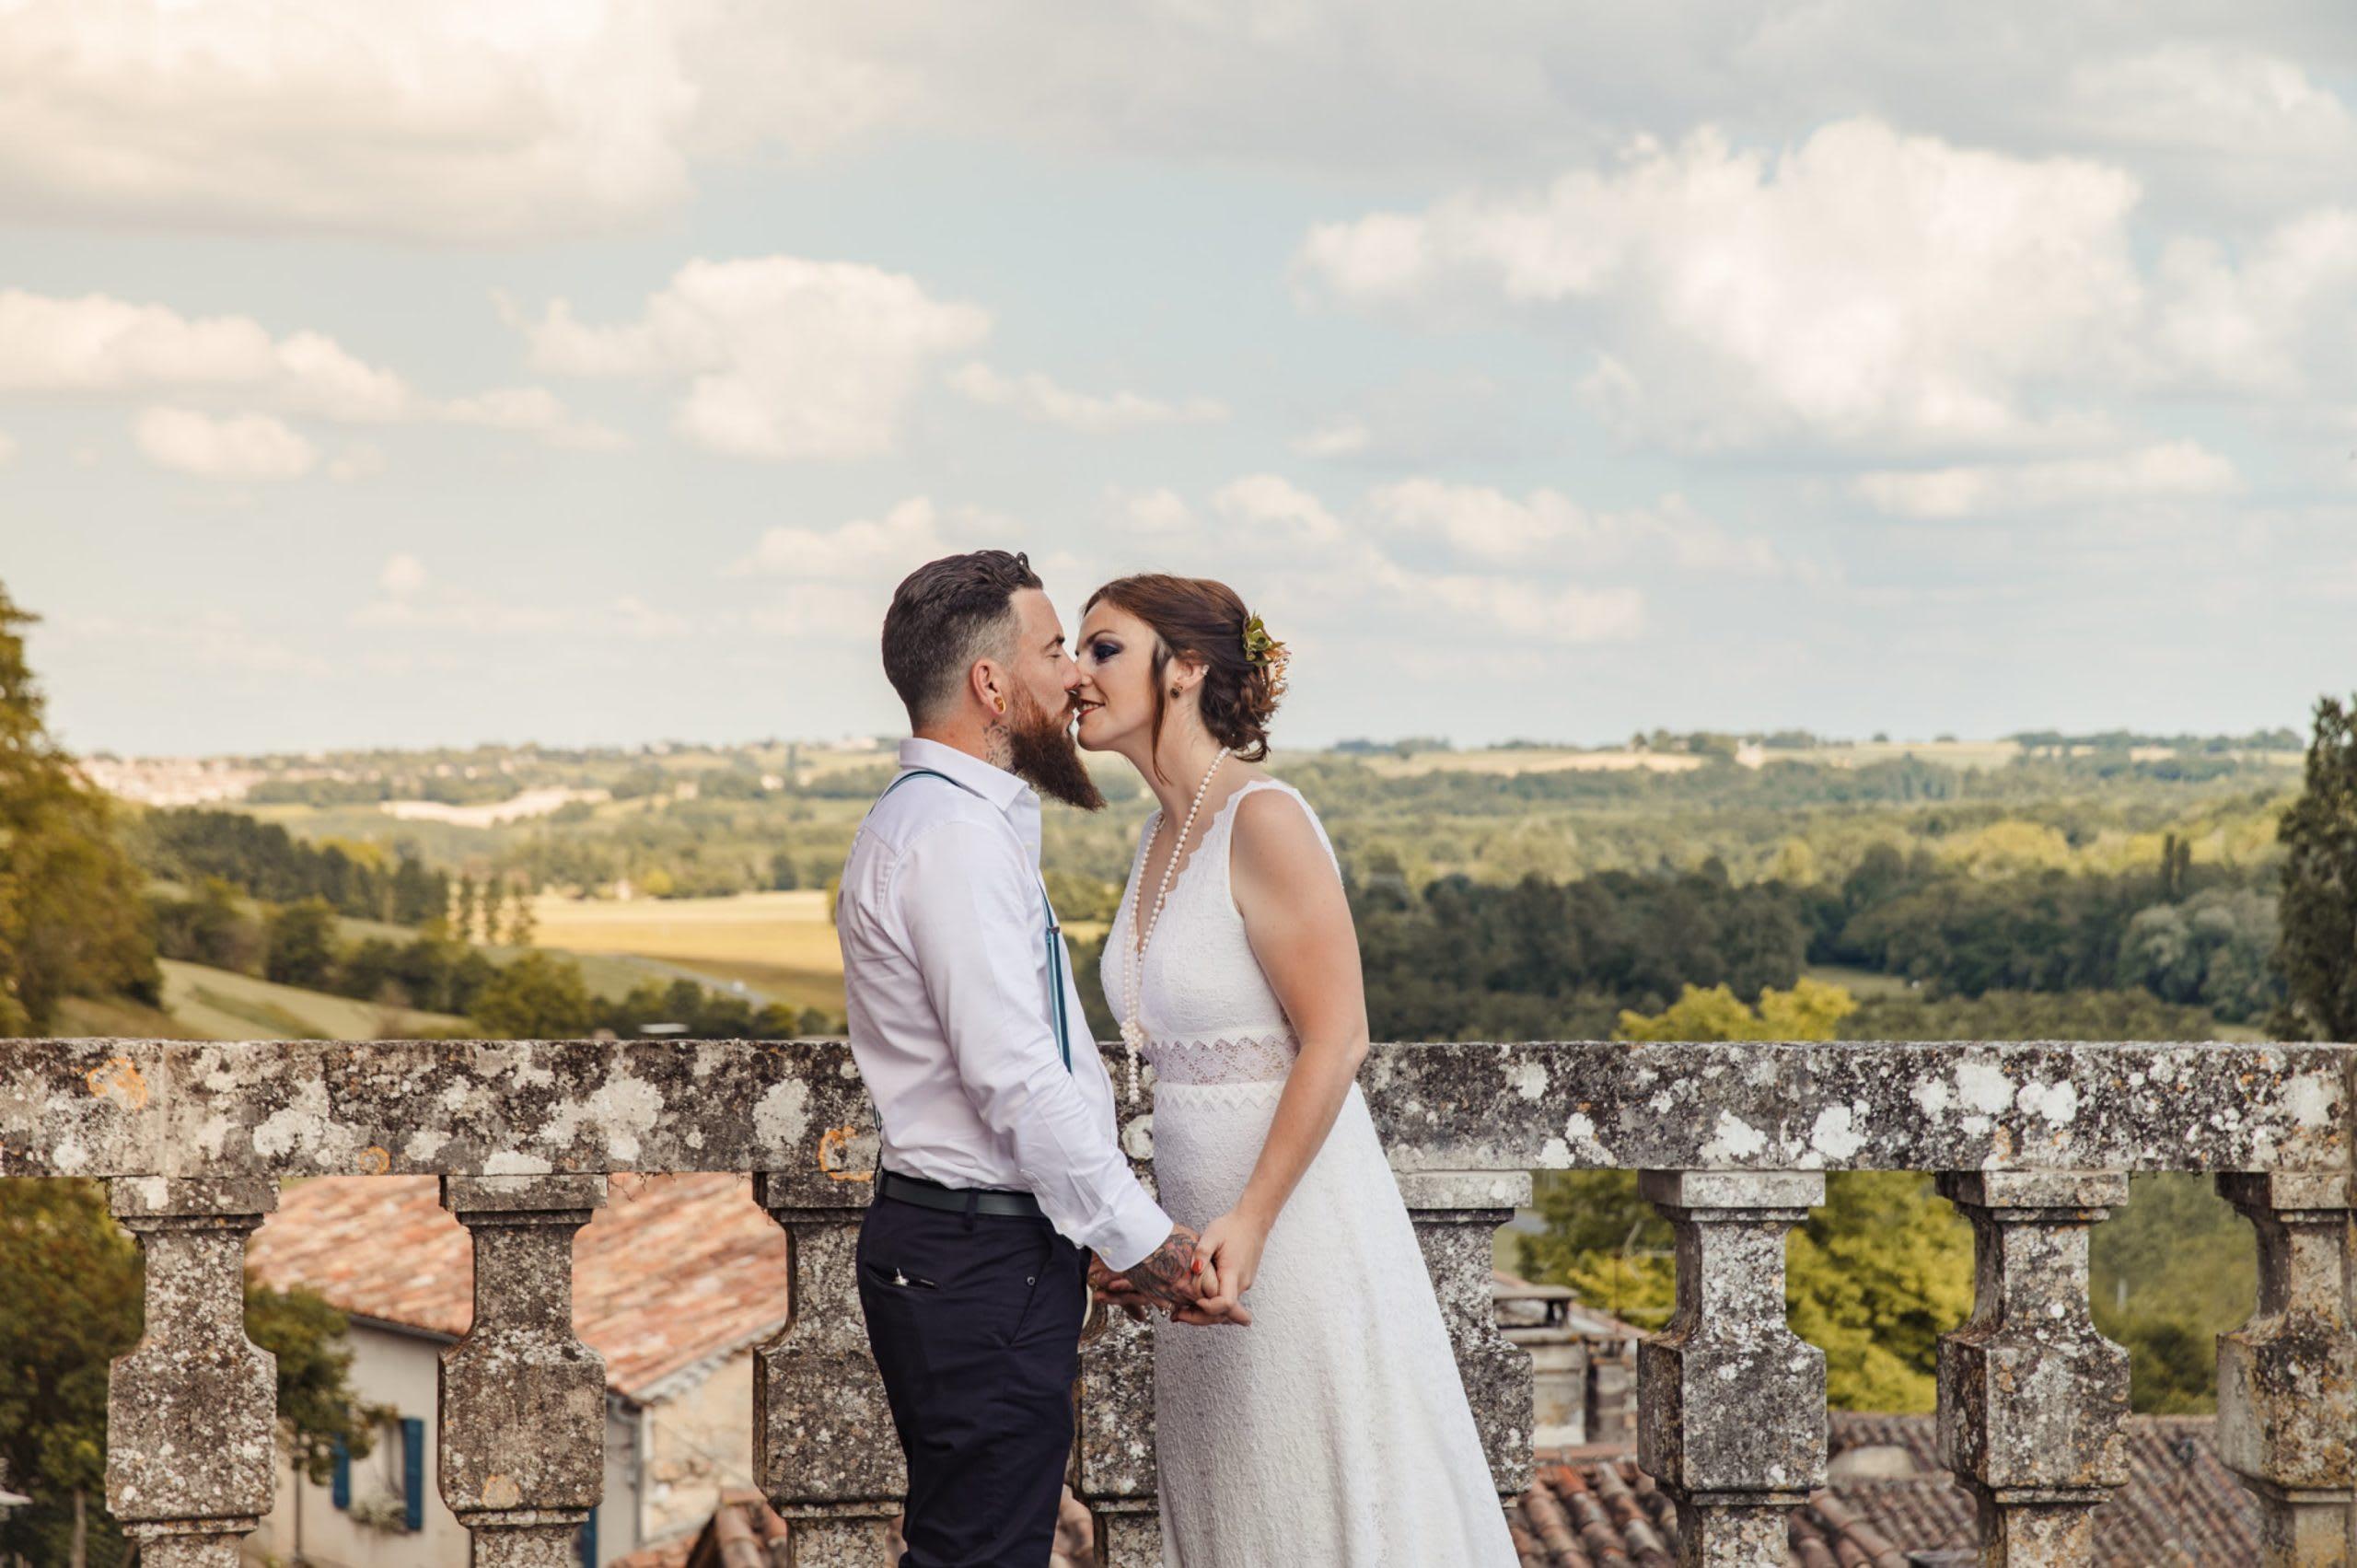 Mariage éco-responsable en Gascogne